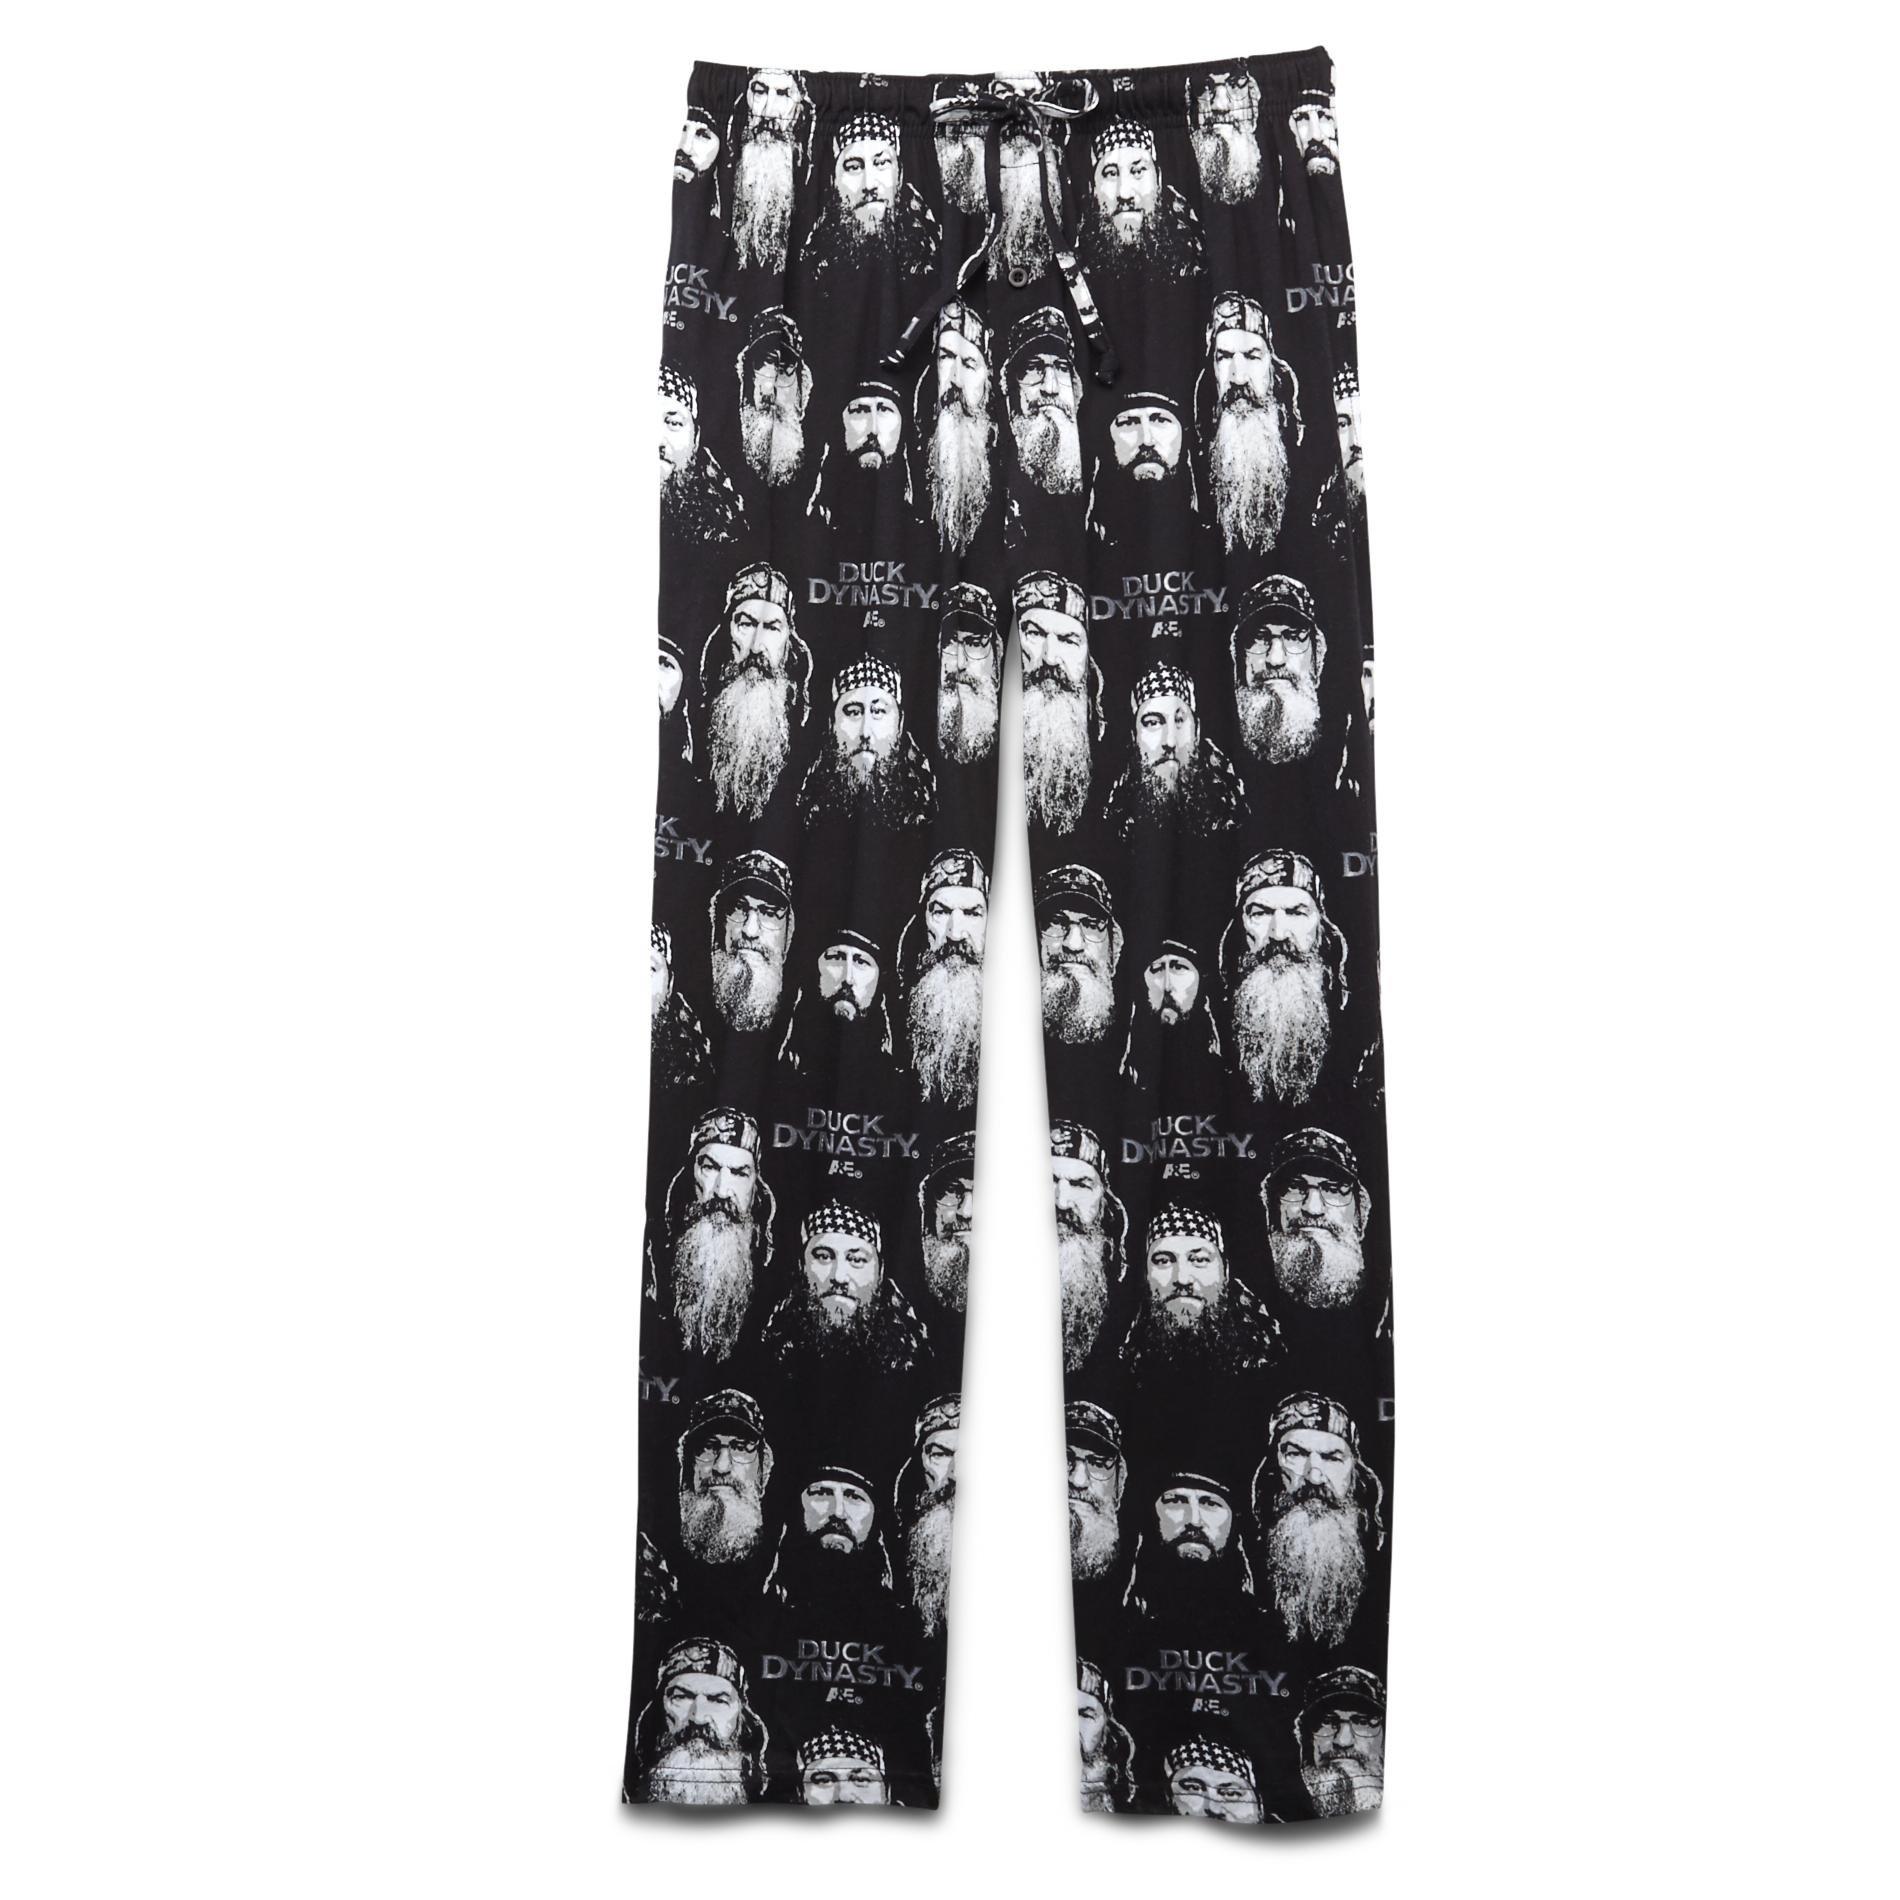 Duck Dynasty Men's Lounge Pajama Sleep Bottom Pants (Small) by Duck Dynasty (Image #1)